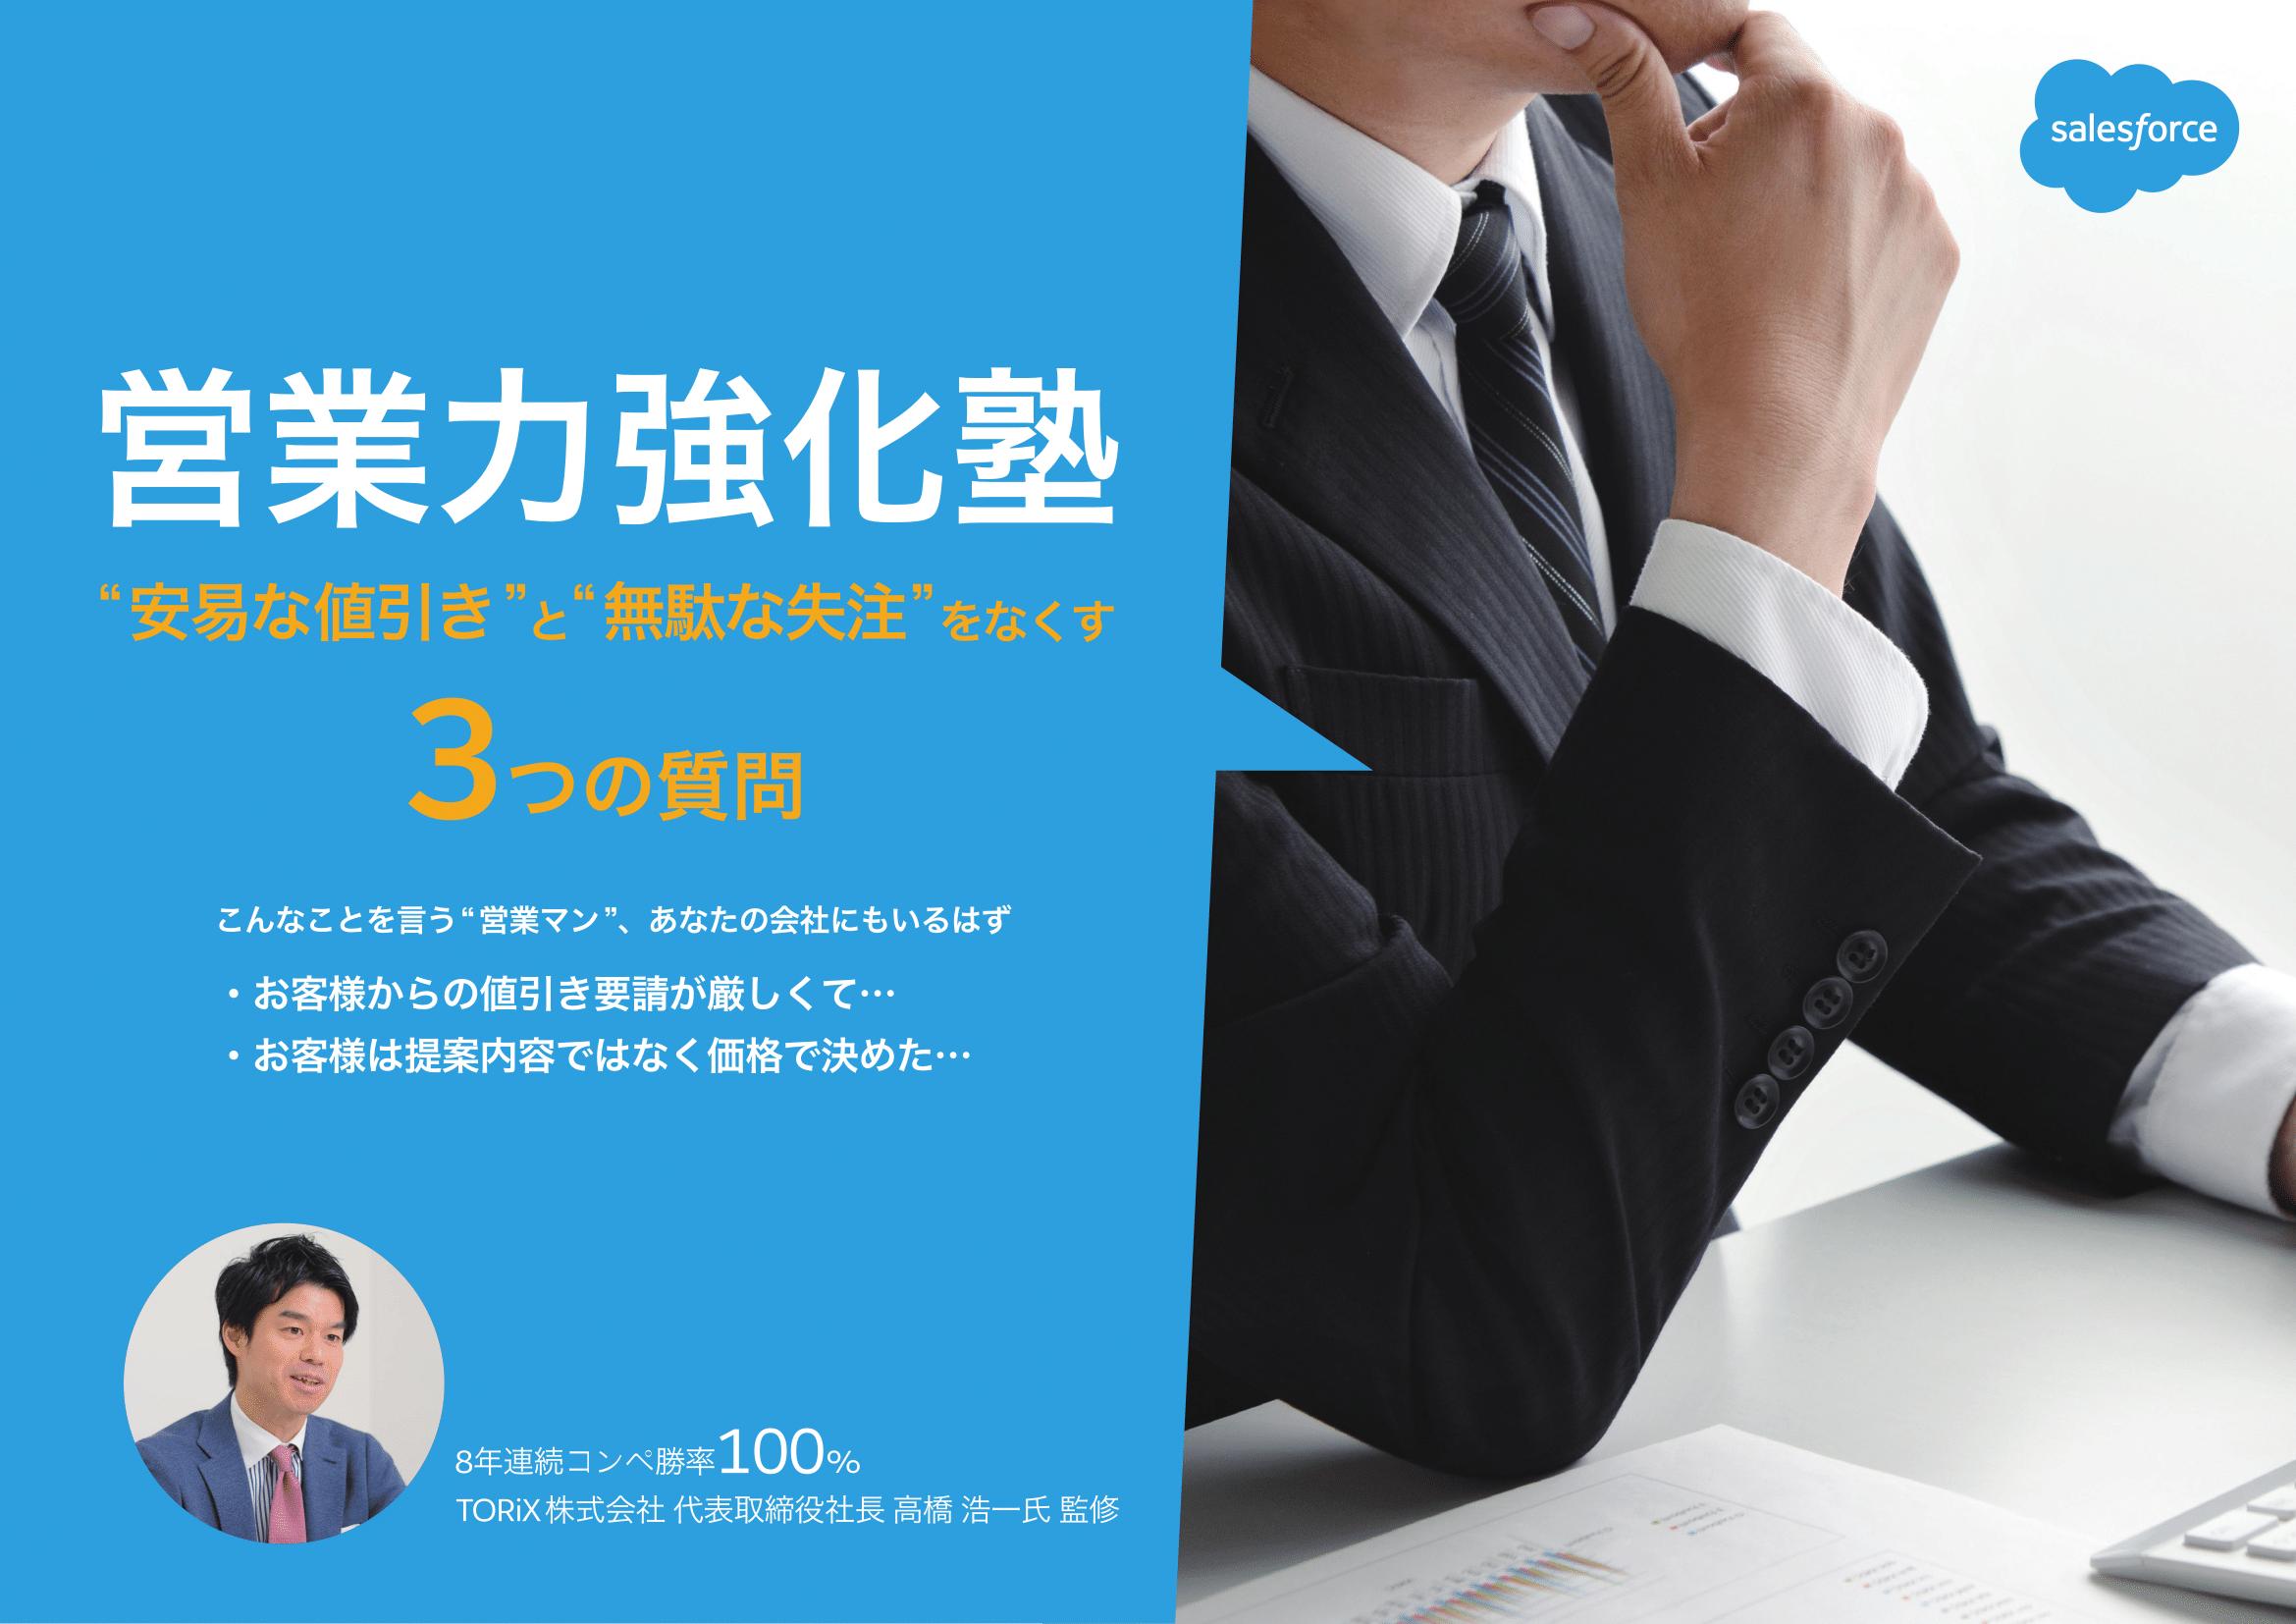 SFDC_営業力強化塾_190213-01.png